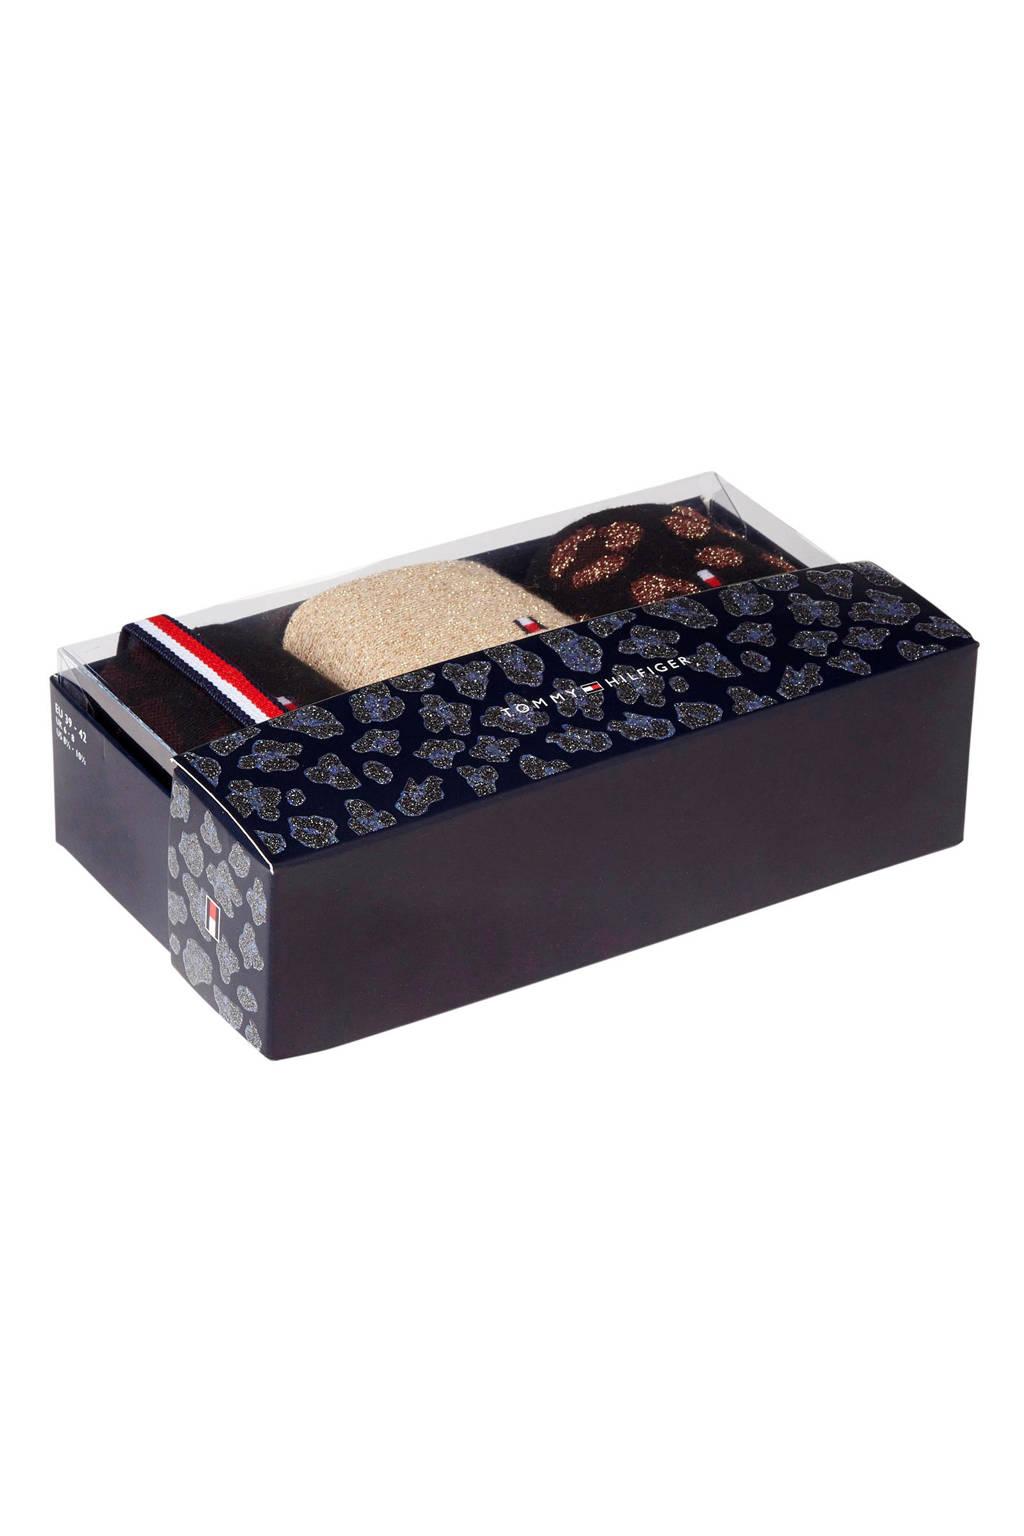 Tommy Hilfiger giftbox sokken ( 3 paar ) rood, Zwart/donkerrood/goud/ecru